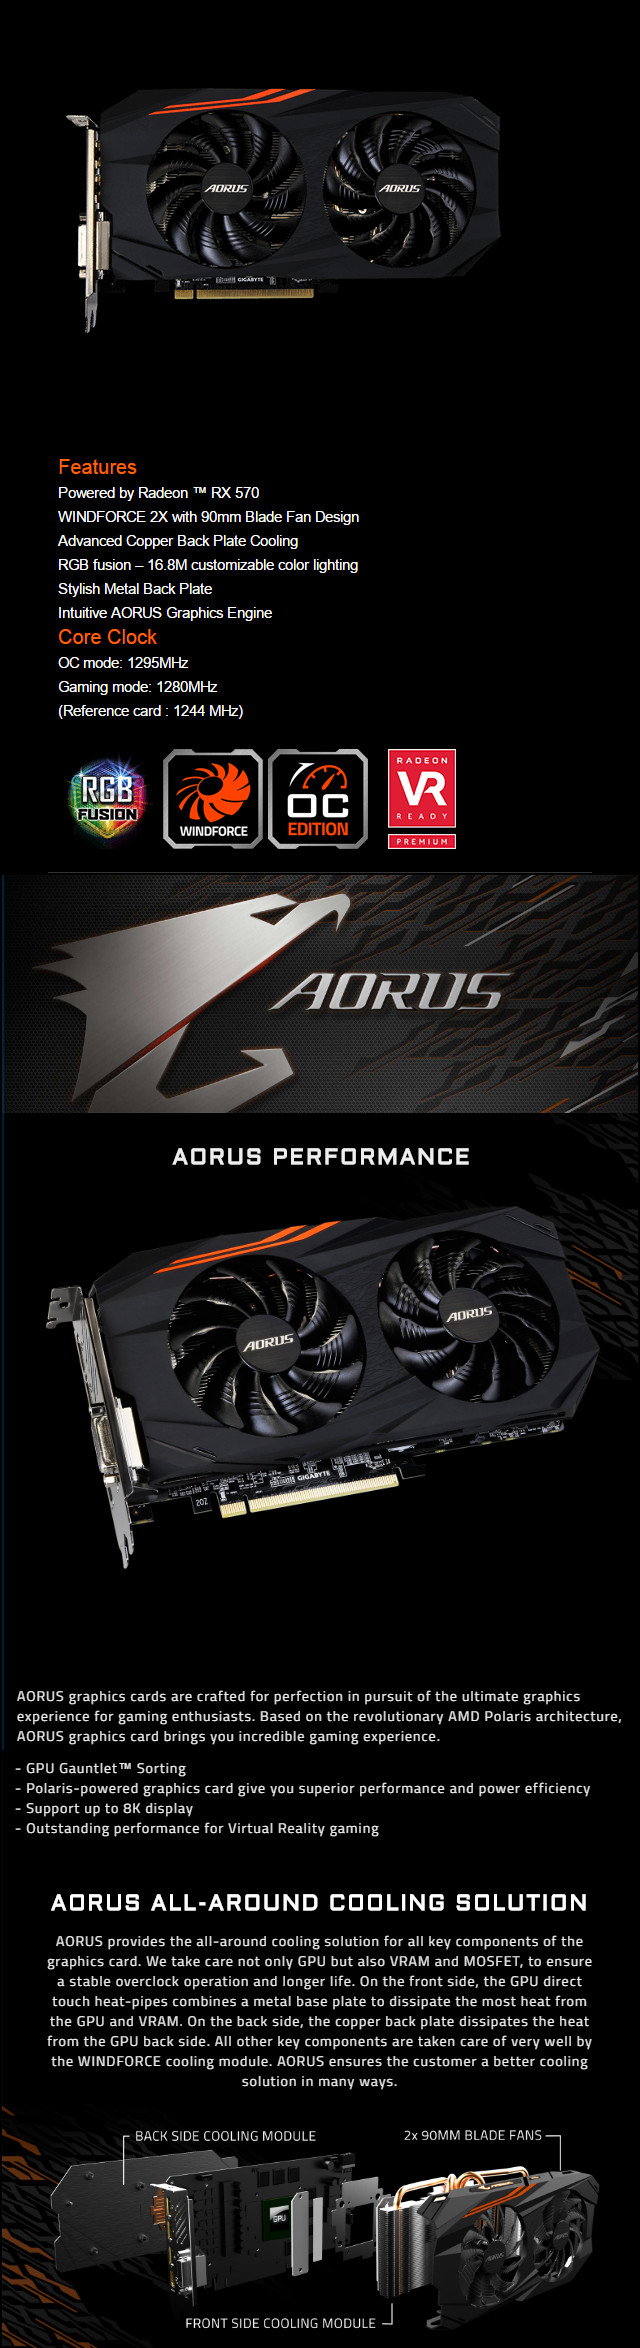 Gigabyte AORUS Radeon RX 570 OC 4GB GDDR5 PCIE GV-RX570AORUS-4GD